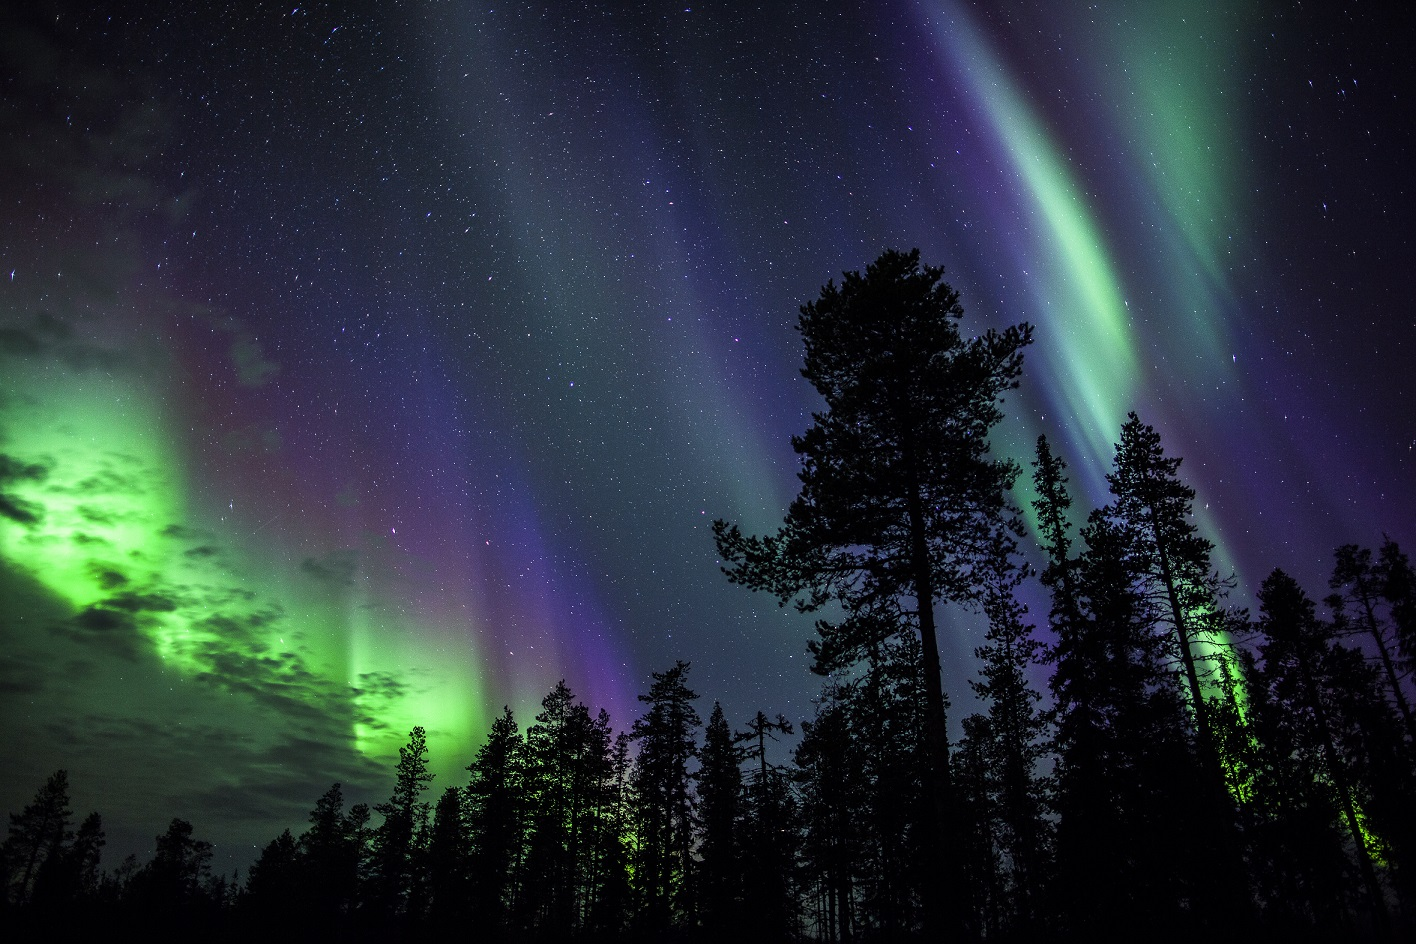 Credit Antti Pietikainen 452 2